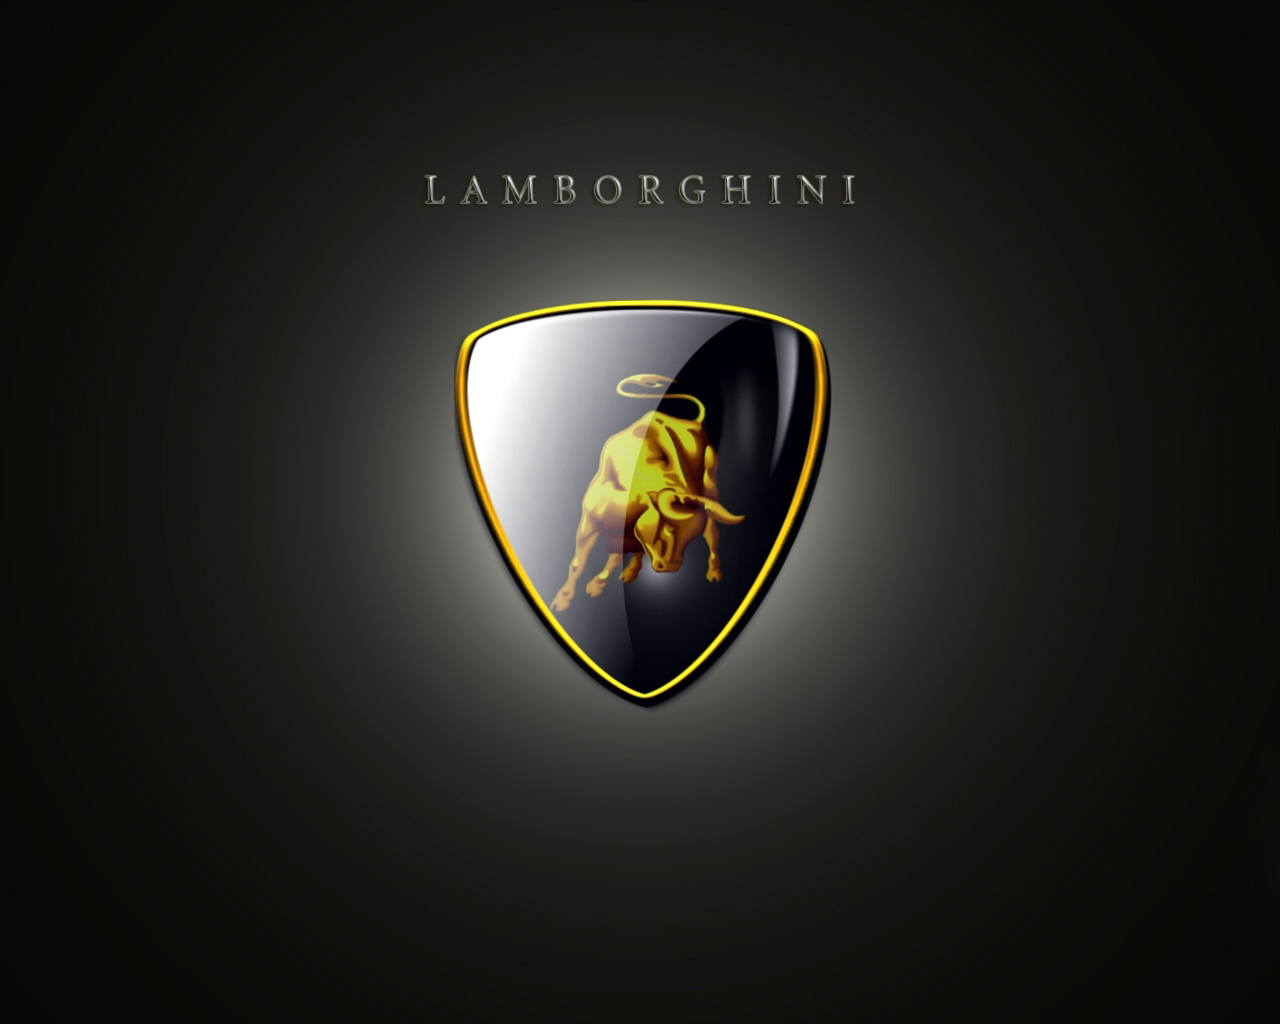 lamborghini logo wallpaper lamborghini lamborghini logo wallpaper 2 1280x1024